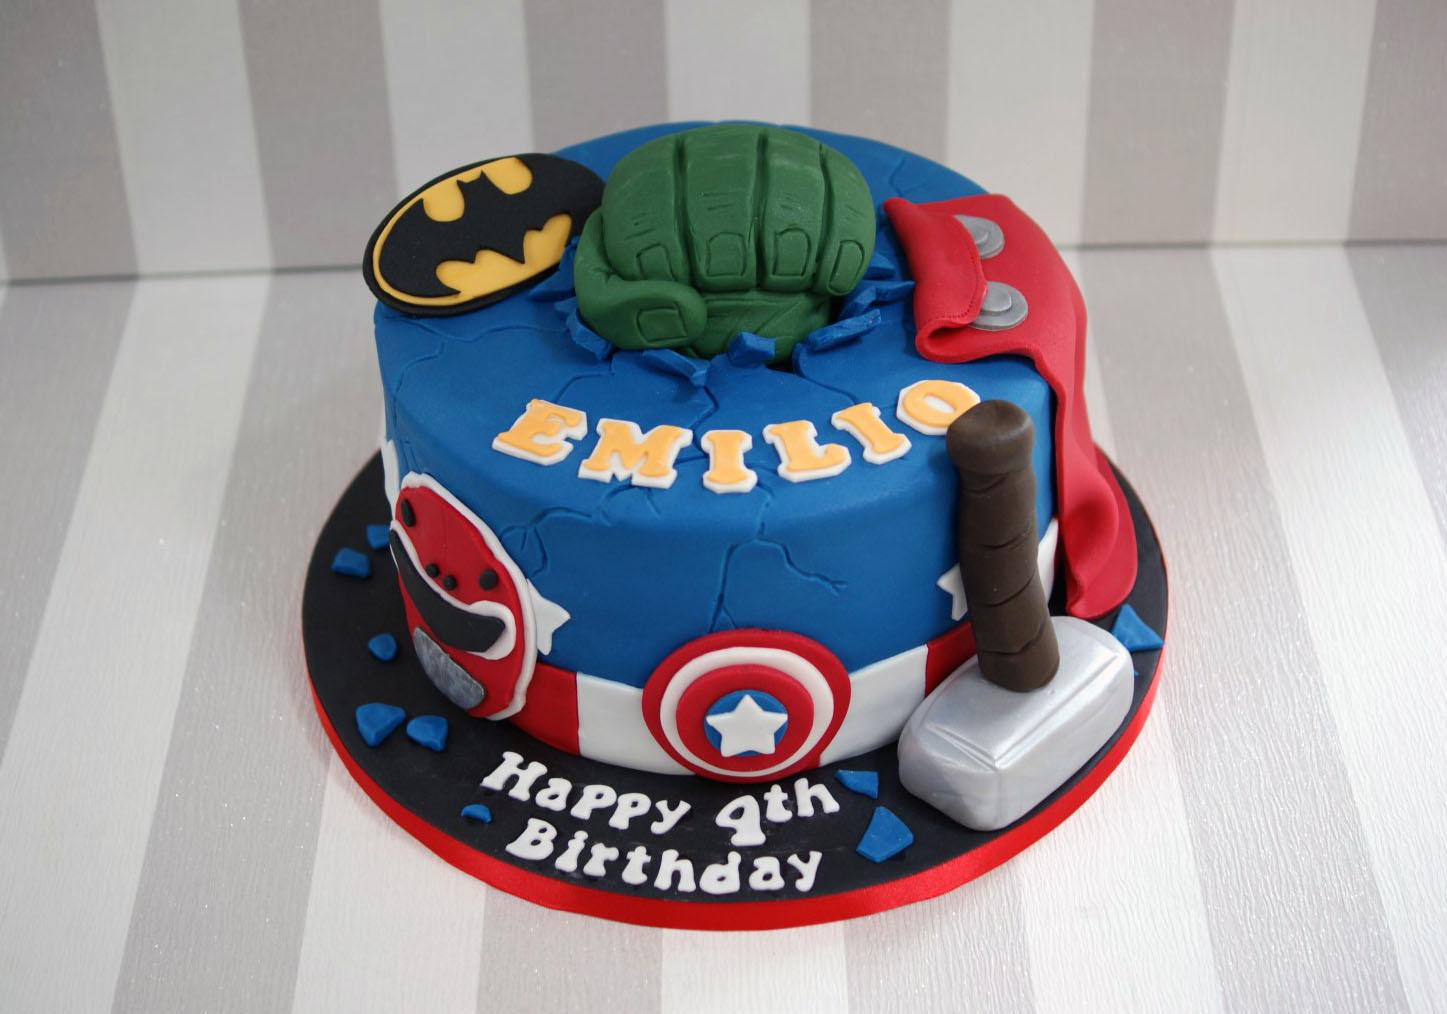 Pleasing Power Rangers And Avengers Birthday Cake 1 Bakealous Funny Birthday Cards Online Alyptdamsfinfo